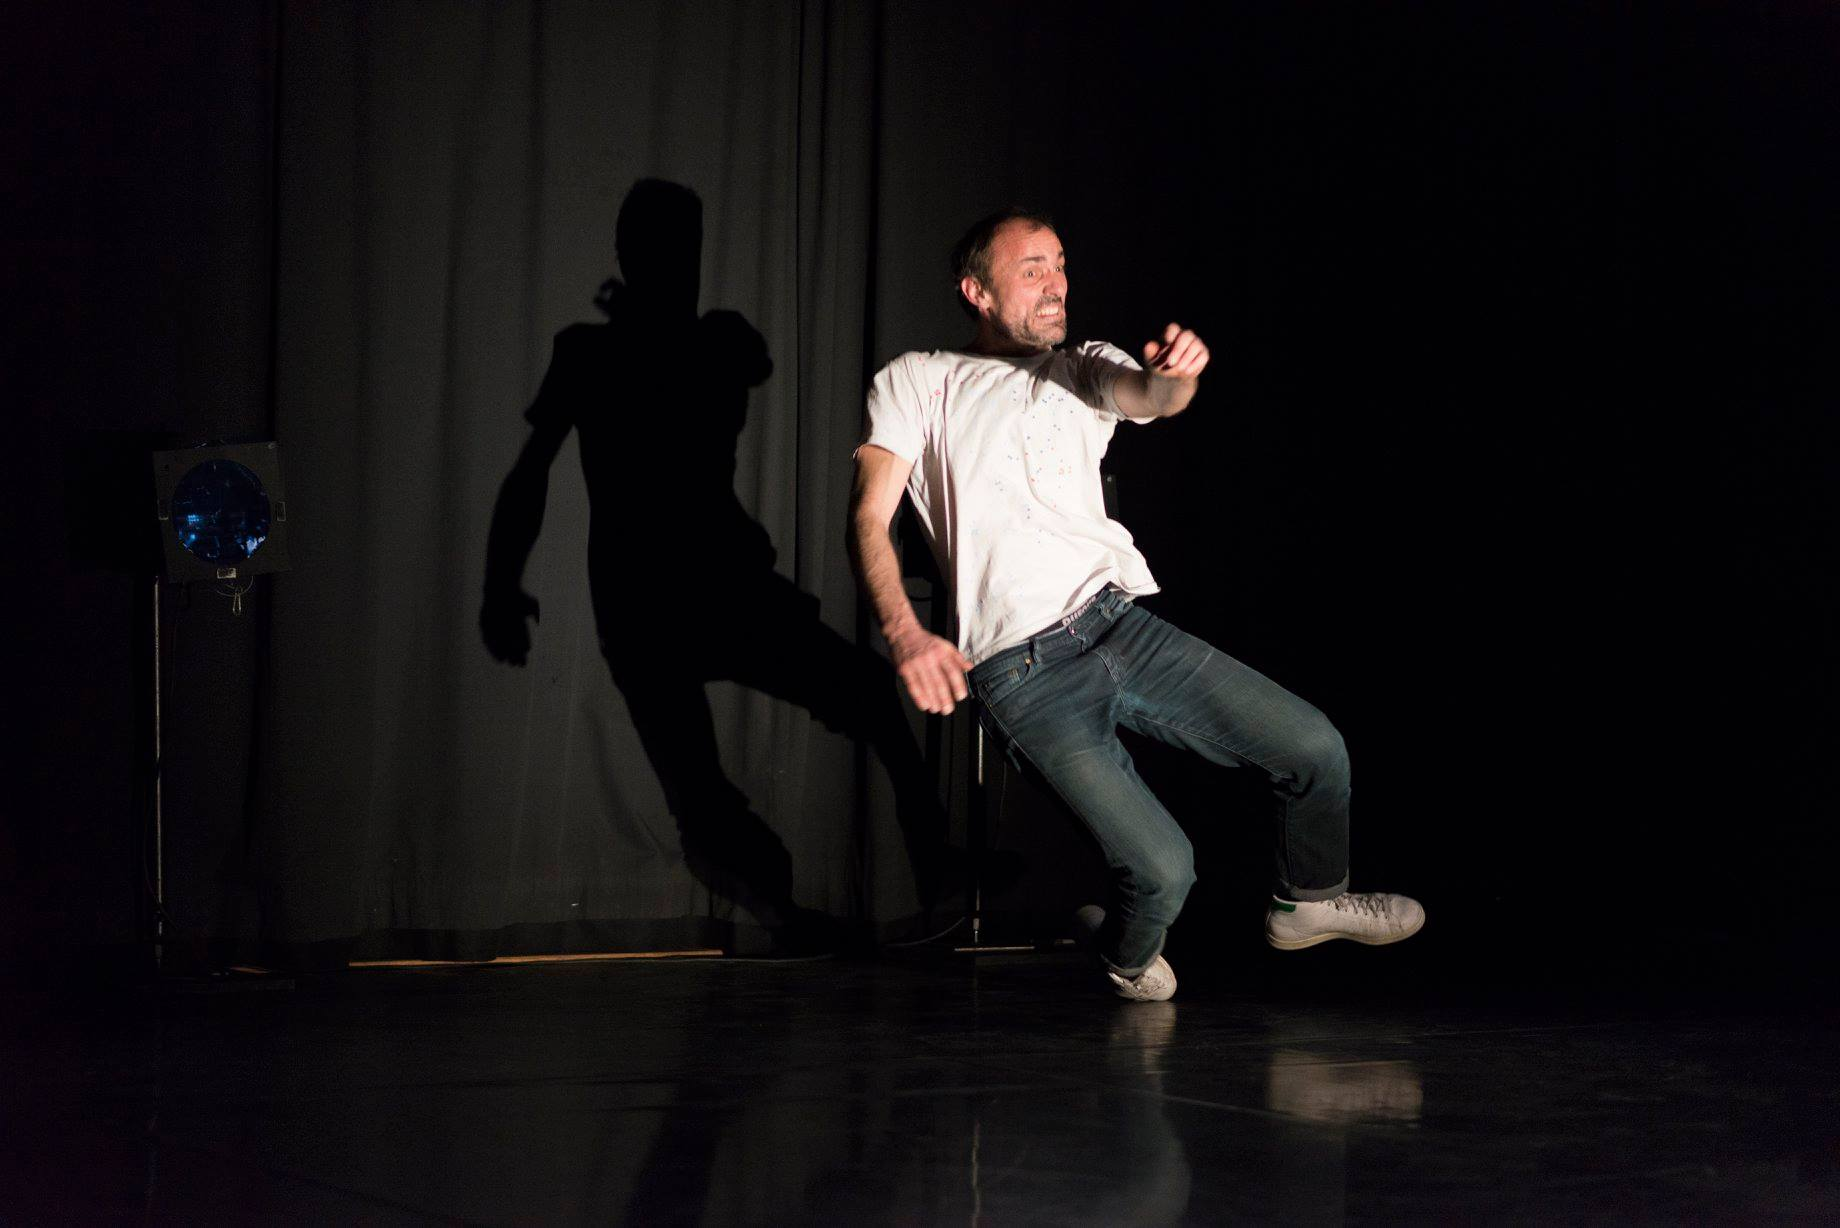 Ante Pavic, FelixGraysonJosephine, Tanzspielzeit Podewil 2016 (Foto: René Löffler)